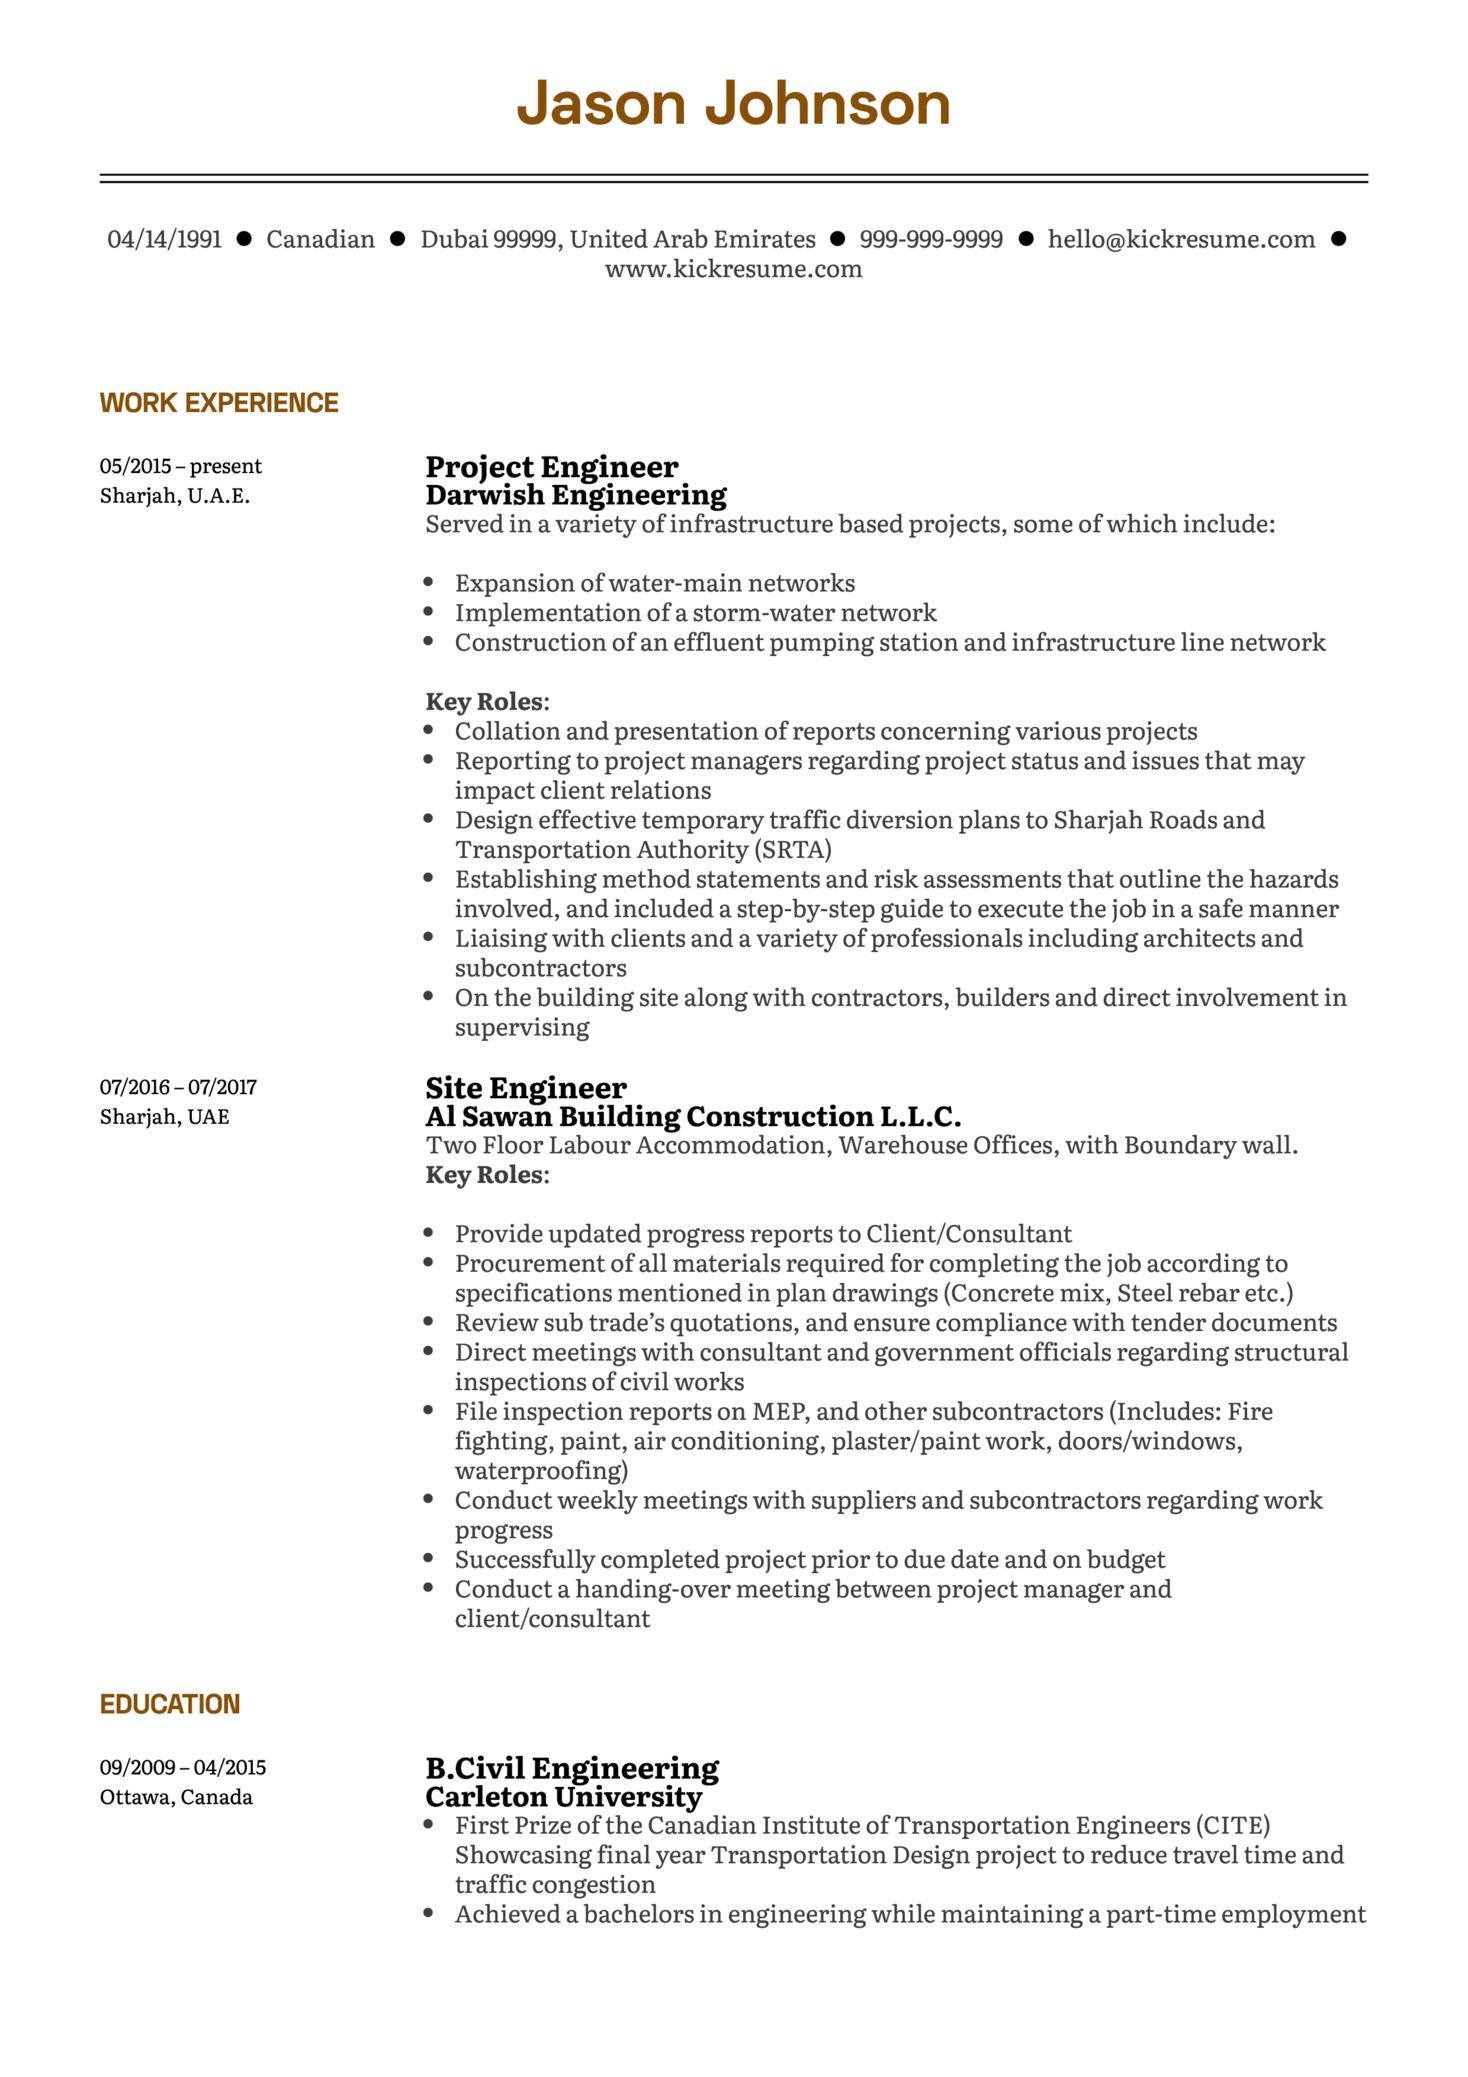 Project Engineer Resume Sample (časť 1)